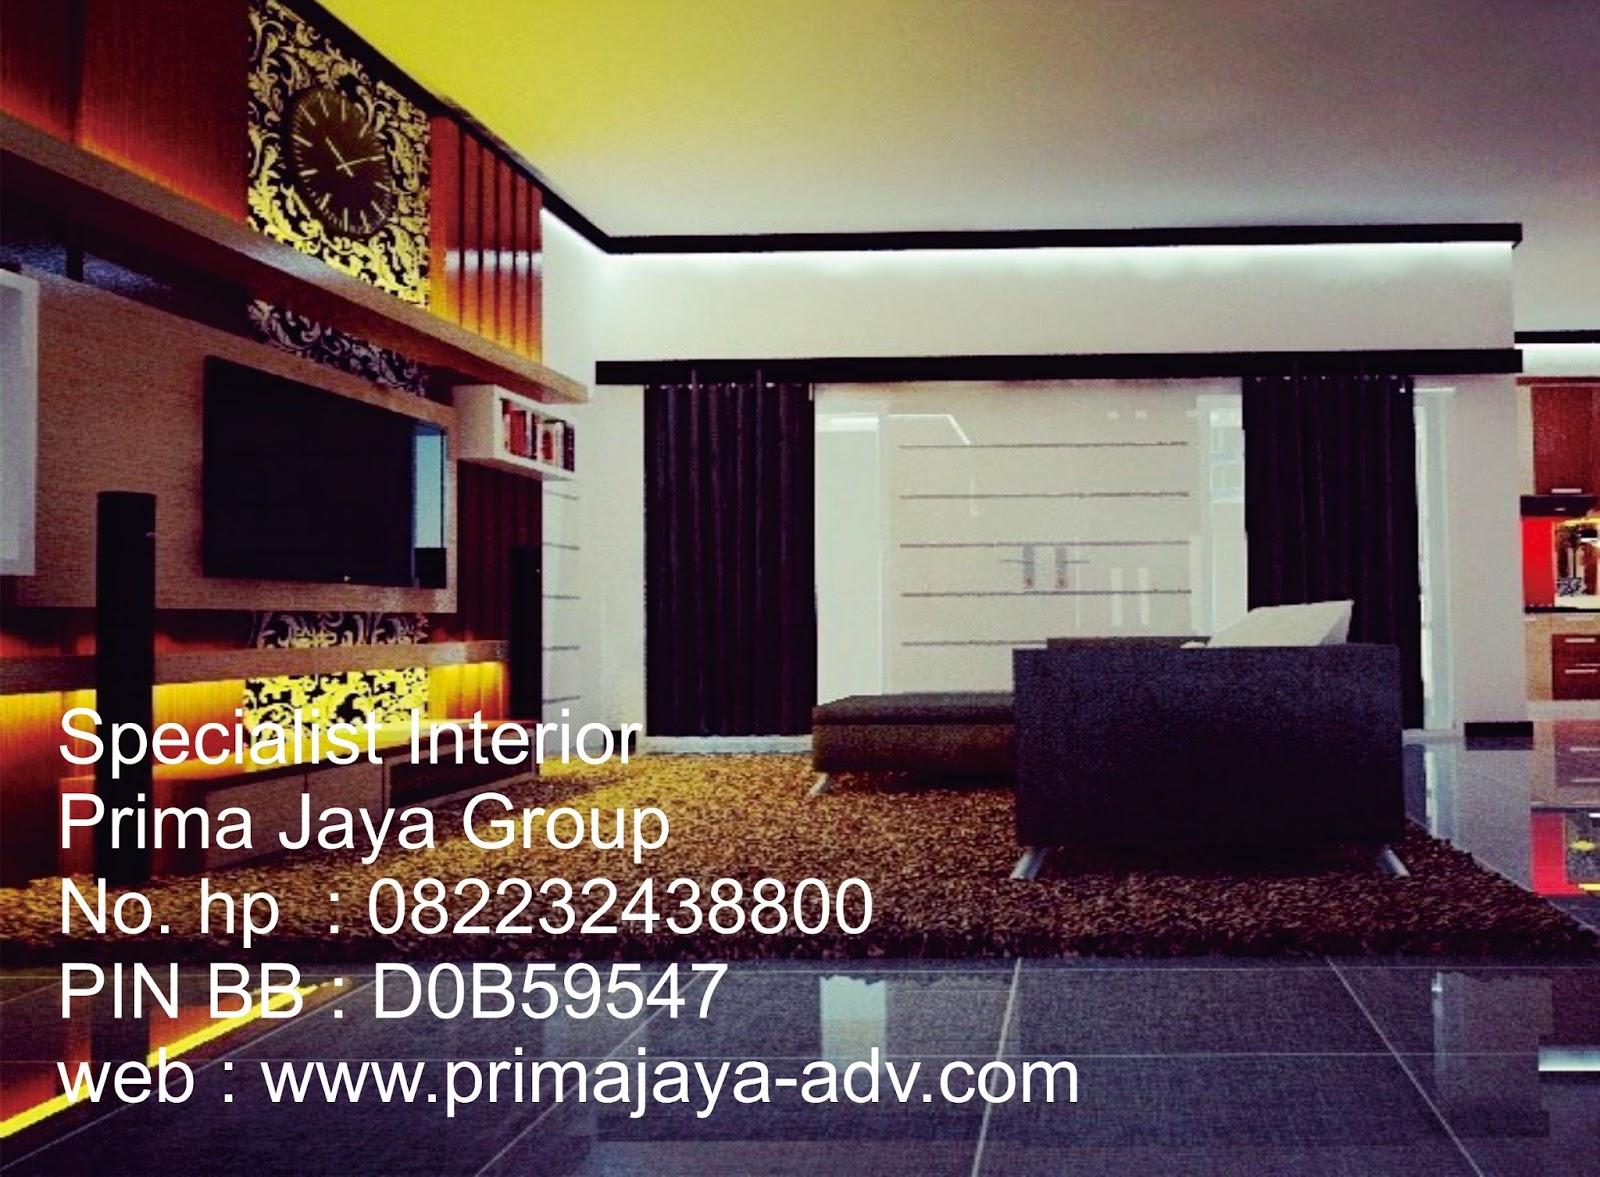 Advertising surabaya 2016 for Design interior surabaya